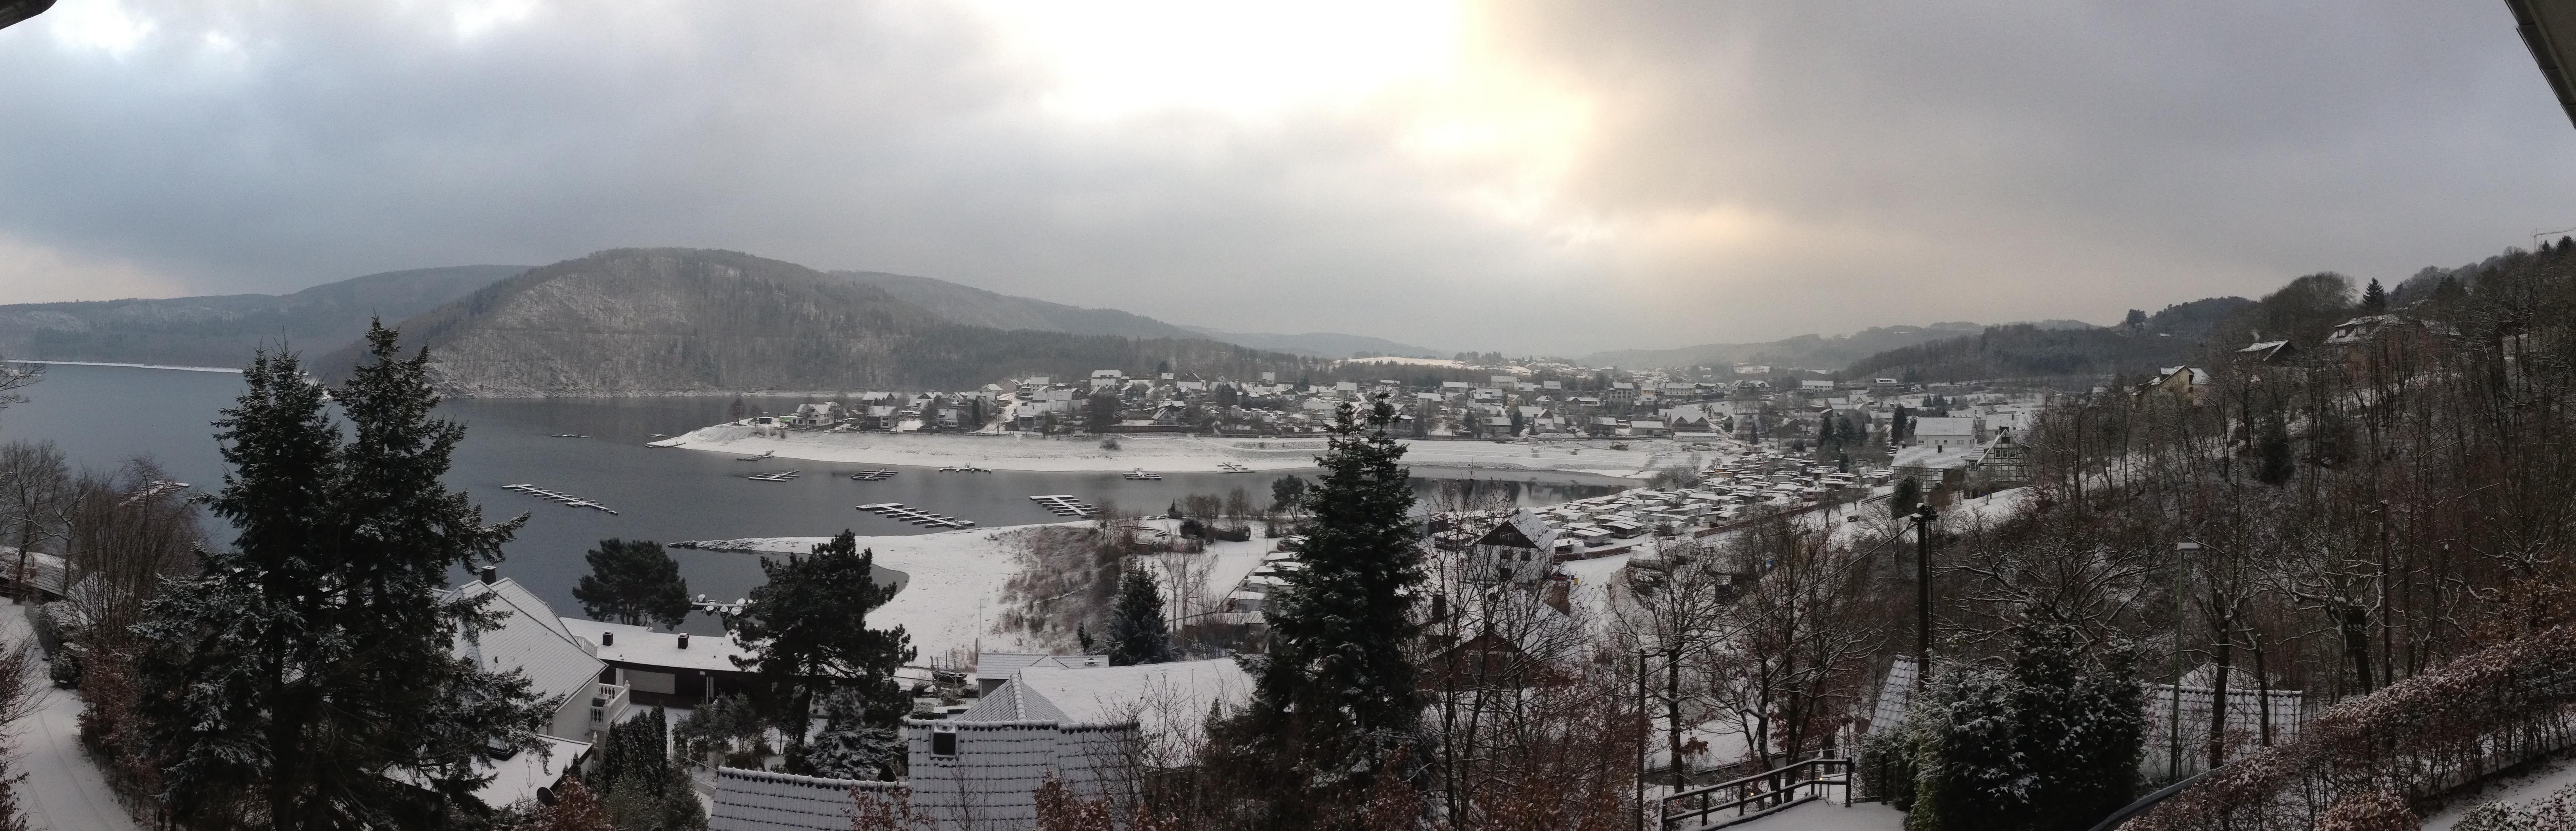 2013_01_14 Panorama Wbach